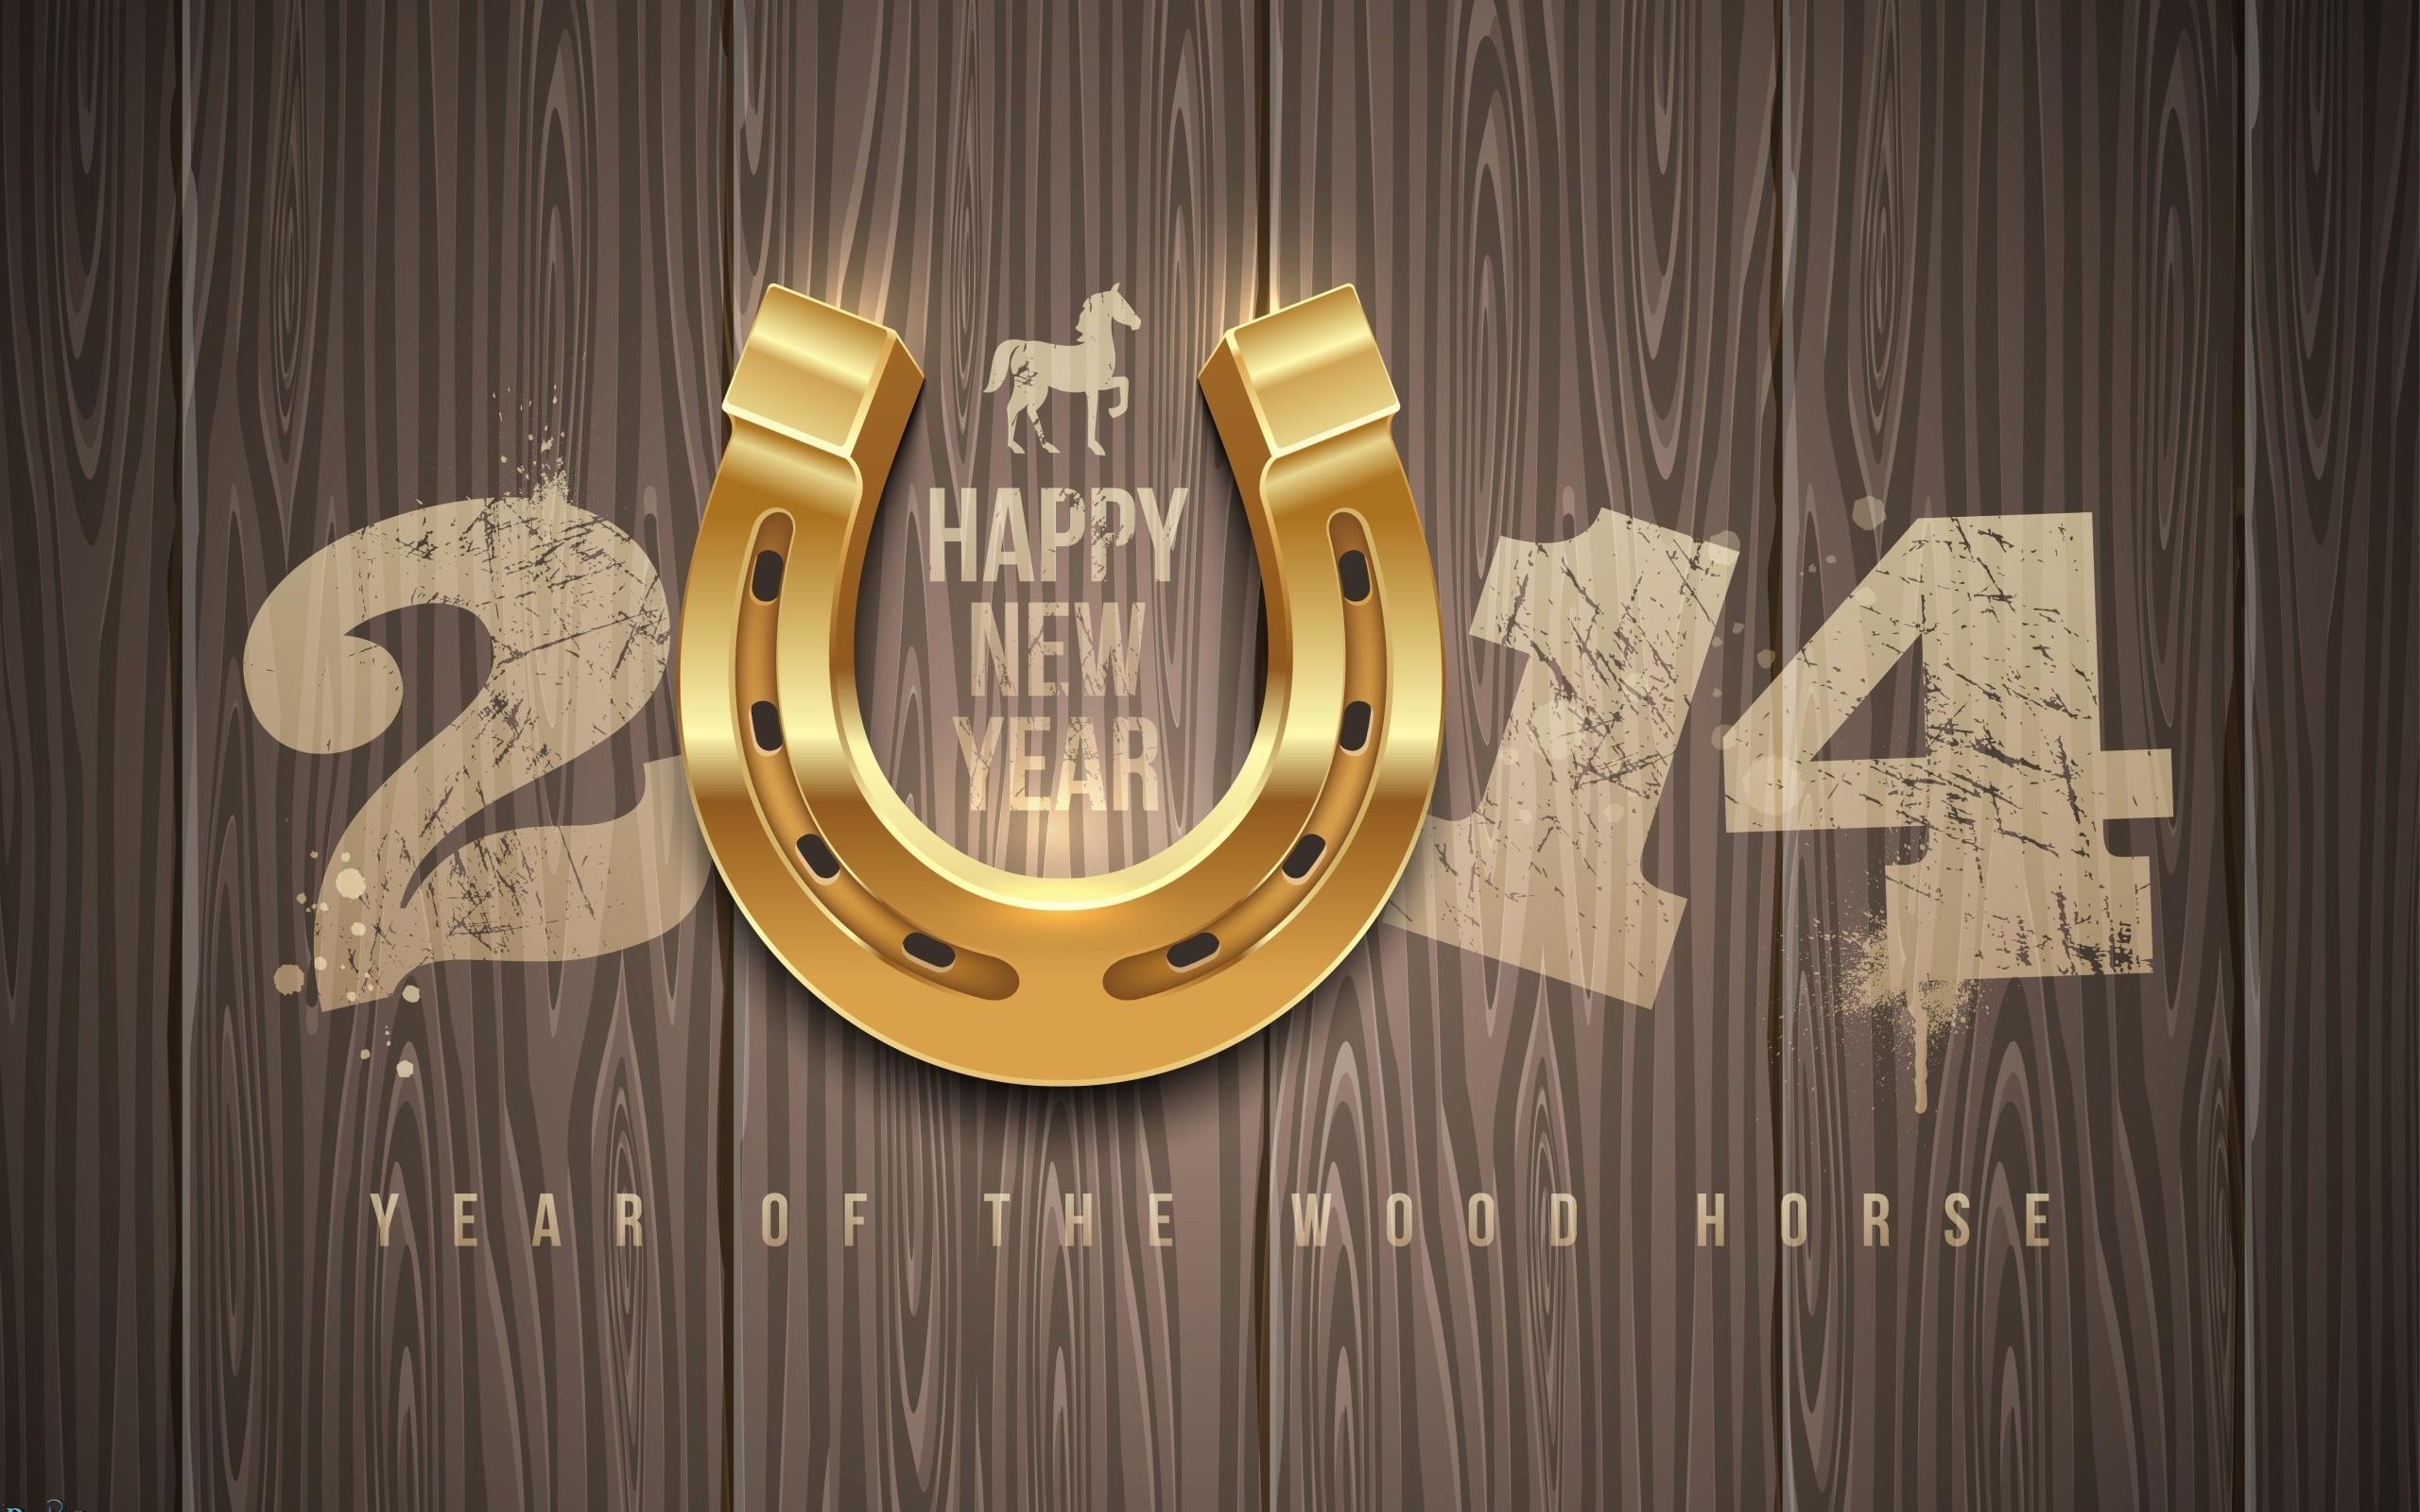 Happy-New-Year-2014-wood-horse_2560x1600.jpg